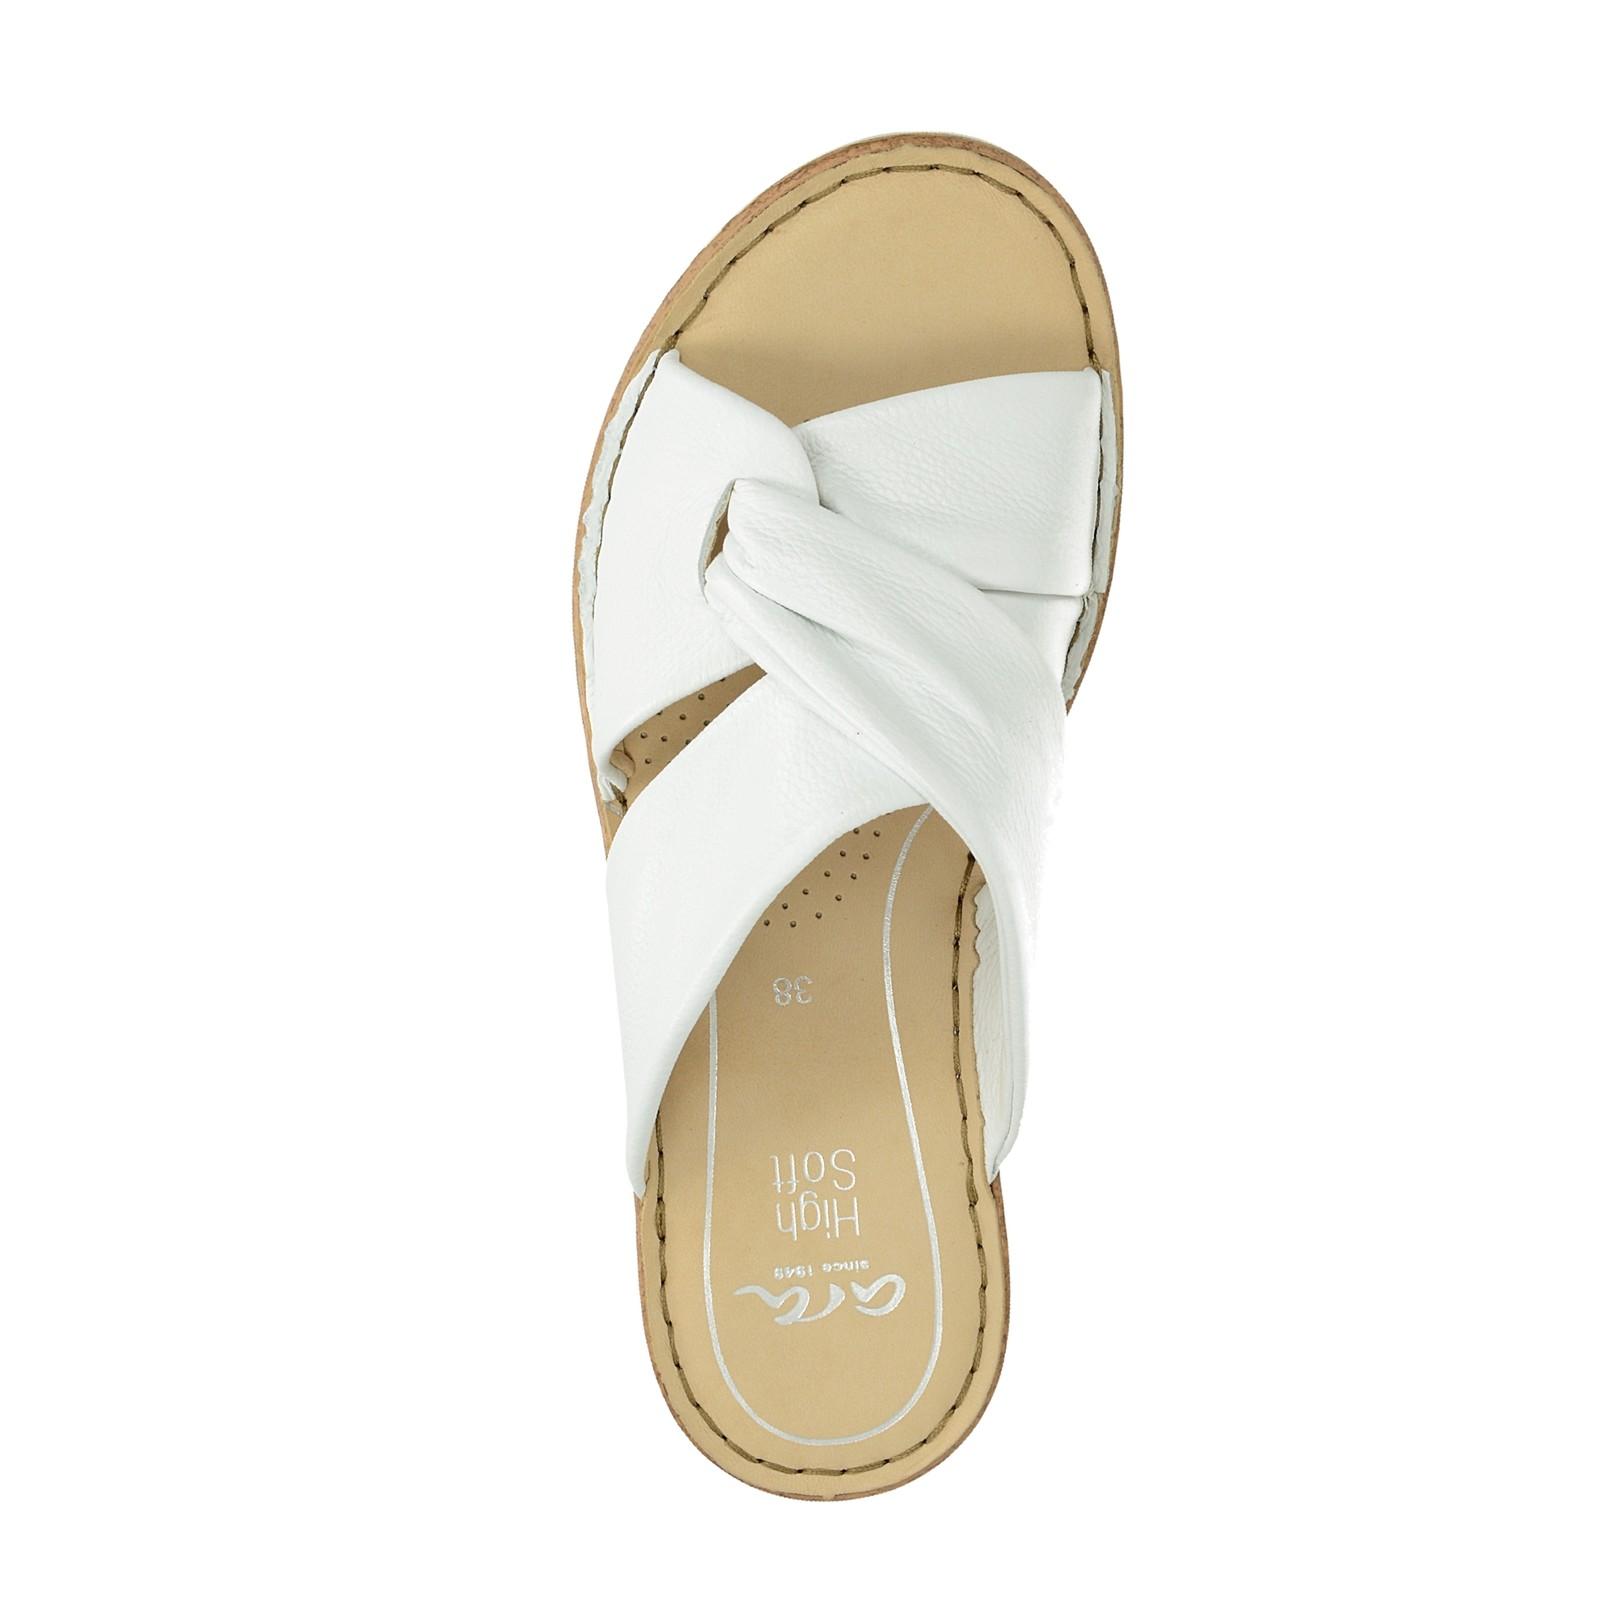 3a9520a97e703 Ara dámske kožené pohodlné šľapky - biele | 121610106-WHT www.robel.sk